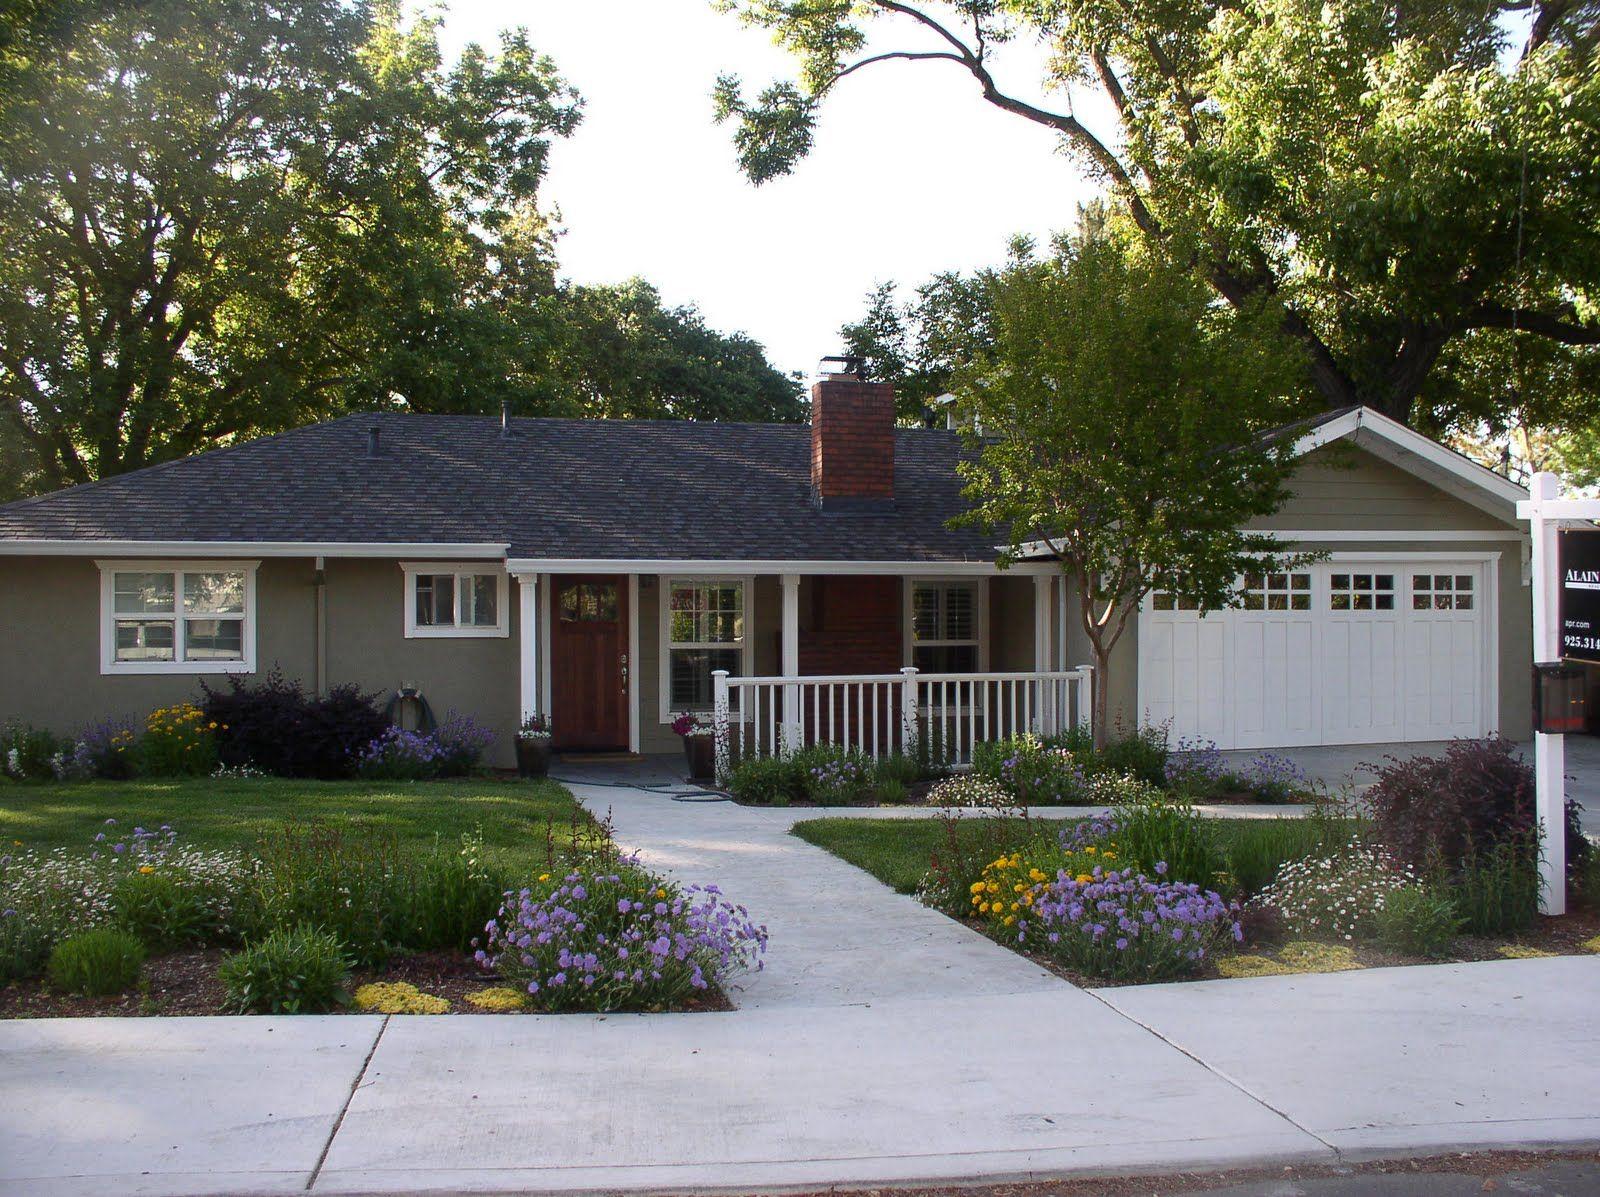 Miraculous 17 Best Images About Exterior Rambler Design Ideas On Pinterest Largest Home Design Picture Inspirations Pitcheantrous